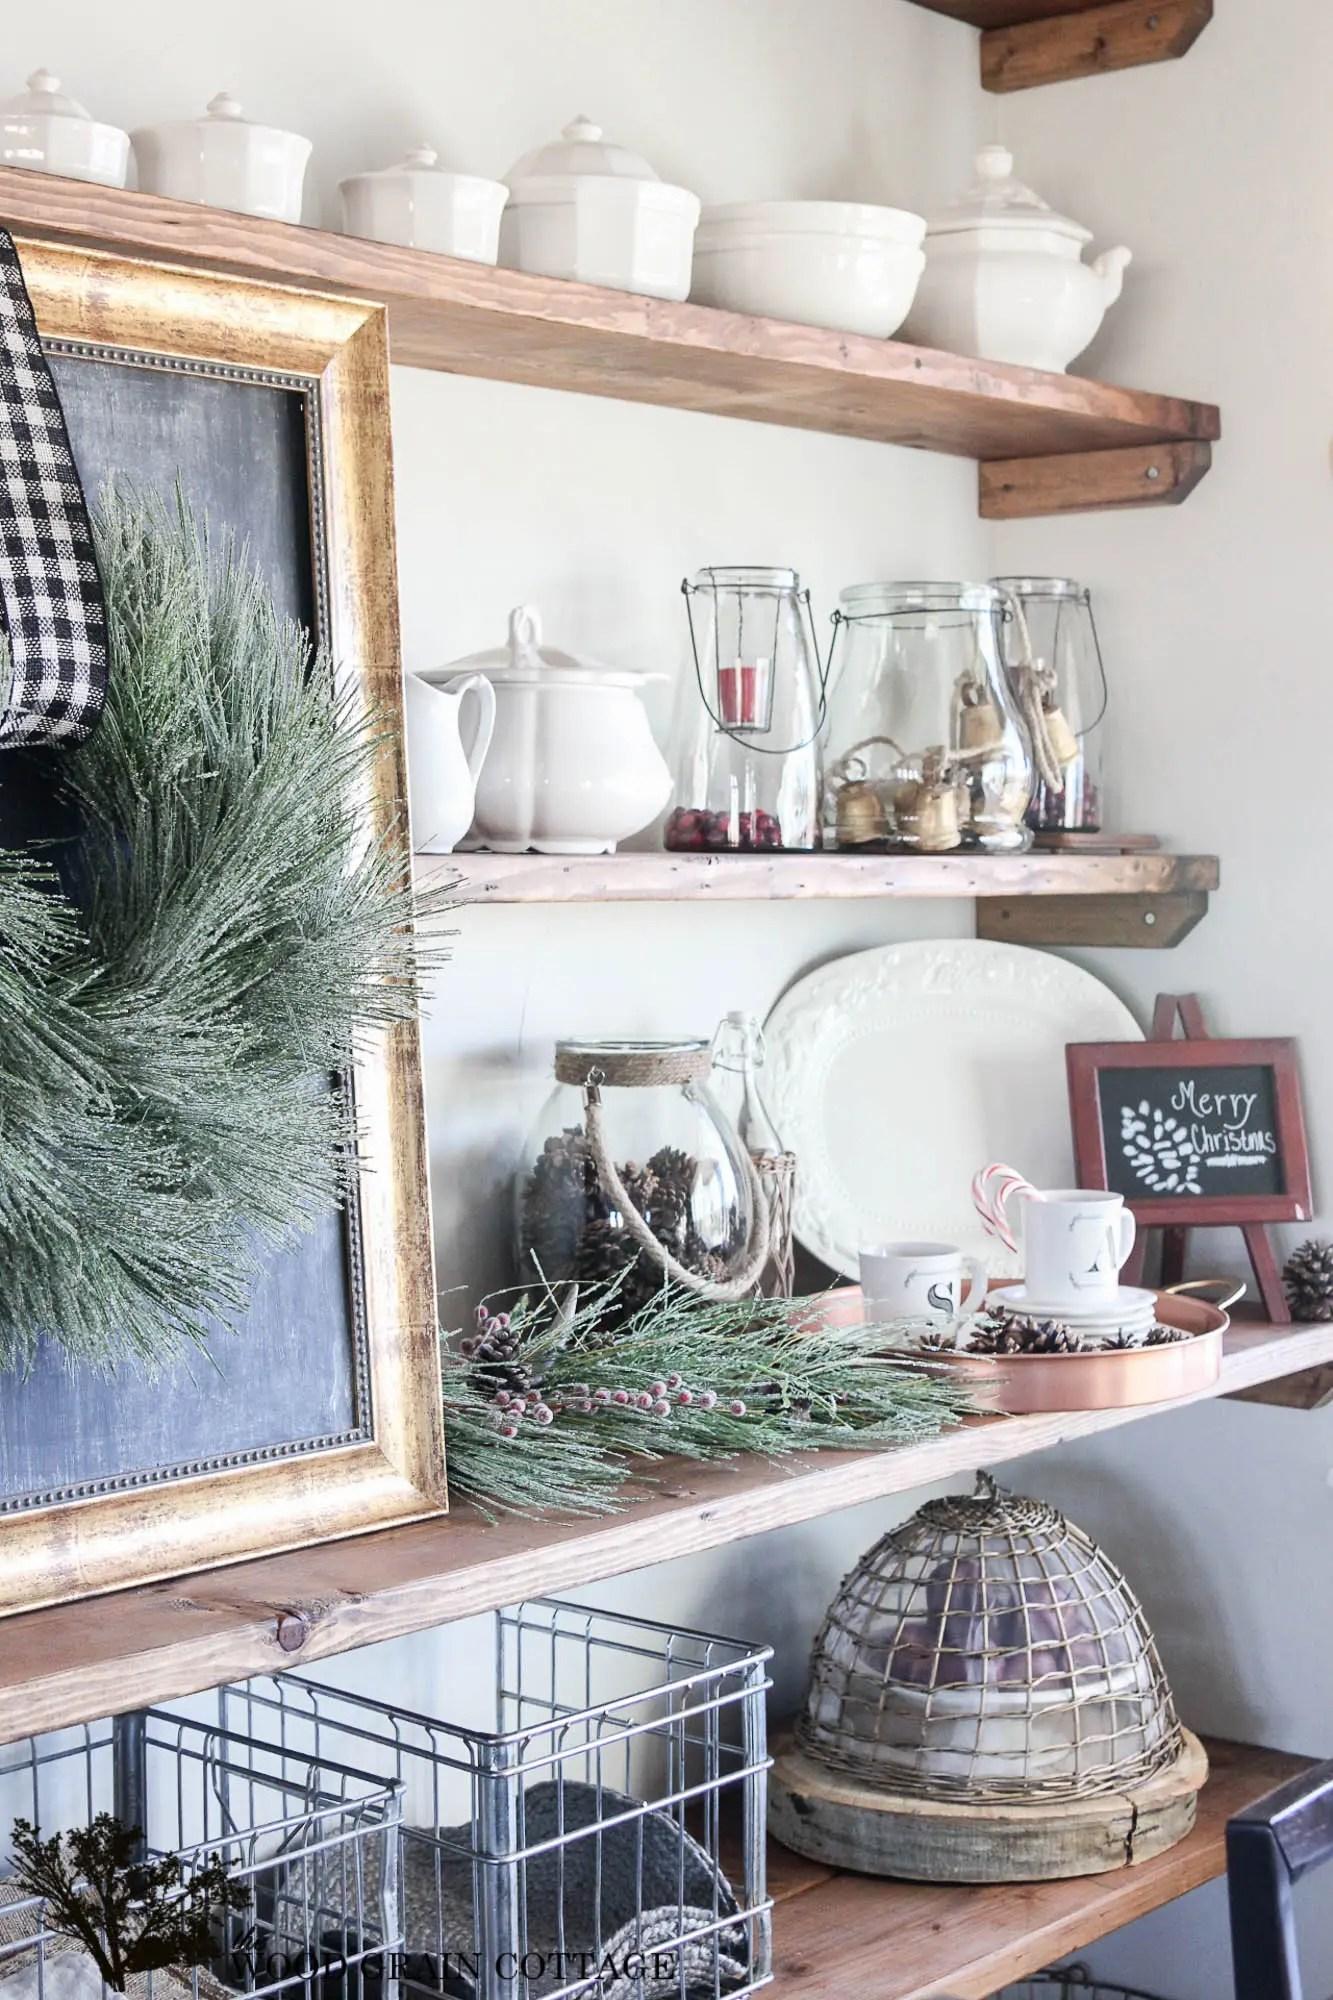 Dining Room Decorating with Kirklands Decor The Halls ... on Kirkland's Home Decor id=57310